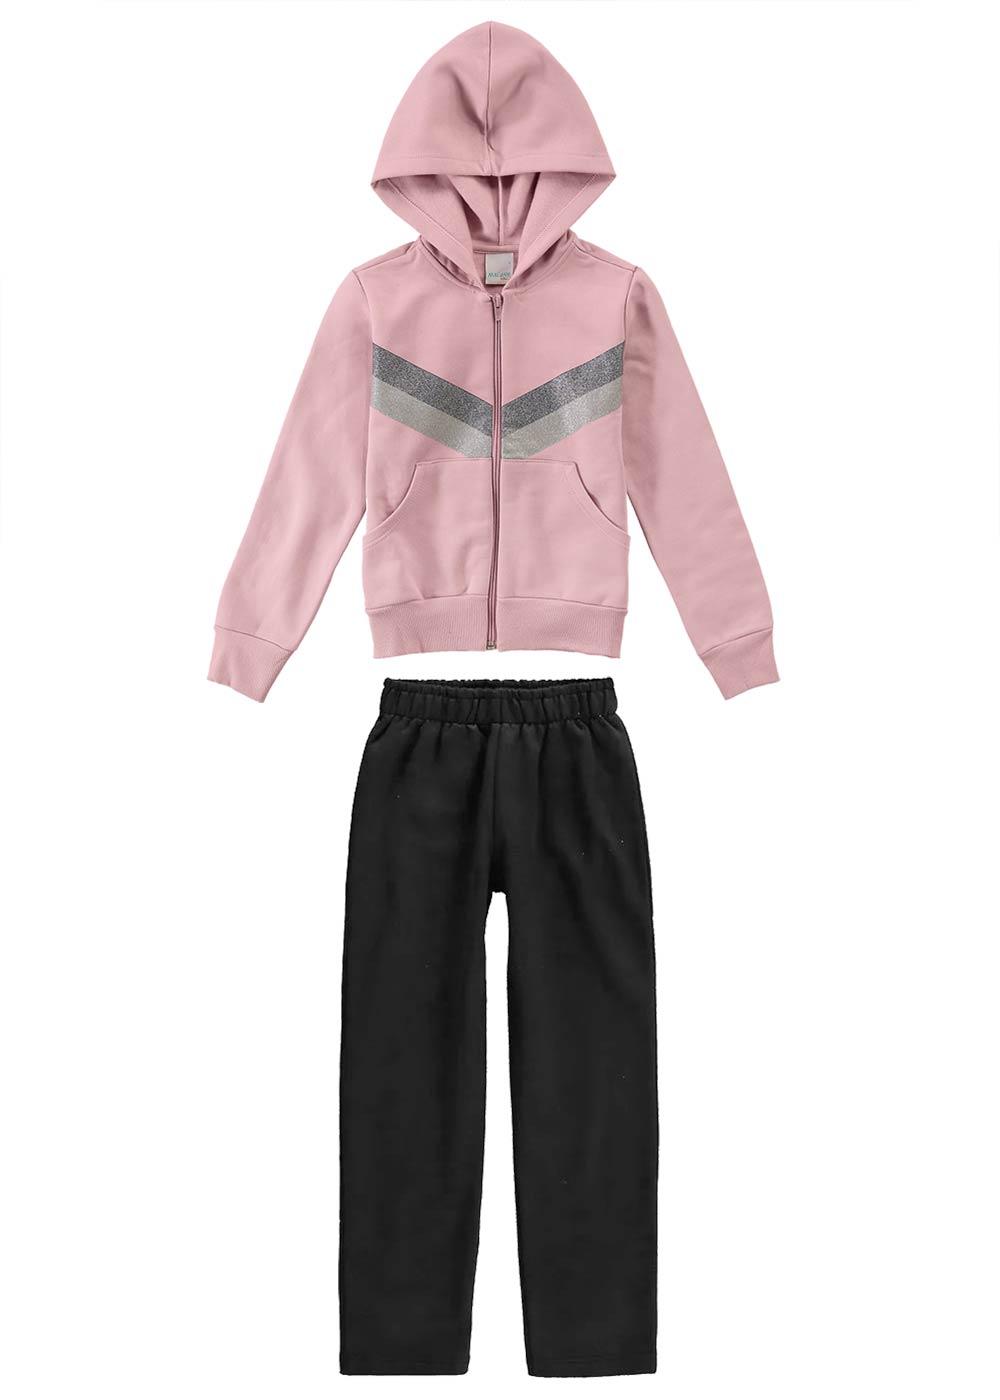 Conjunto Inverno Infantil Feminino Rosa - Malwee